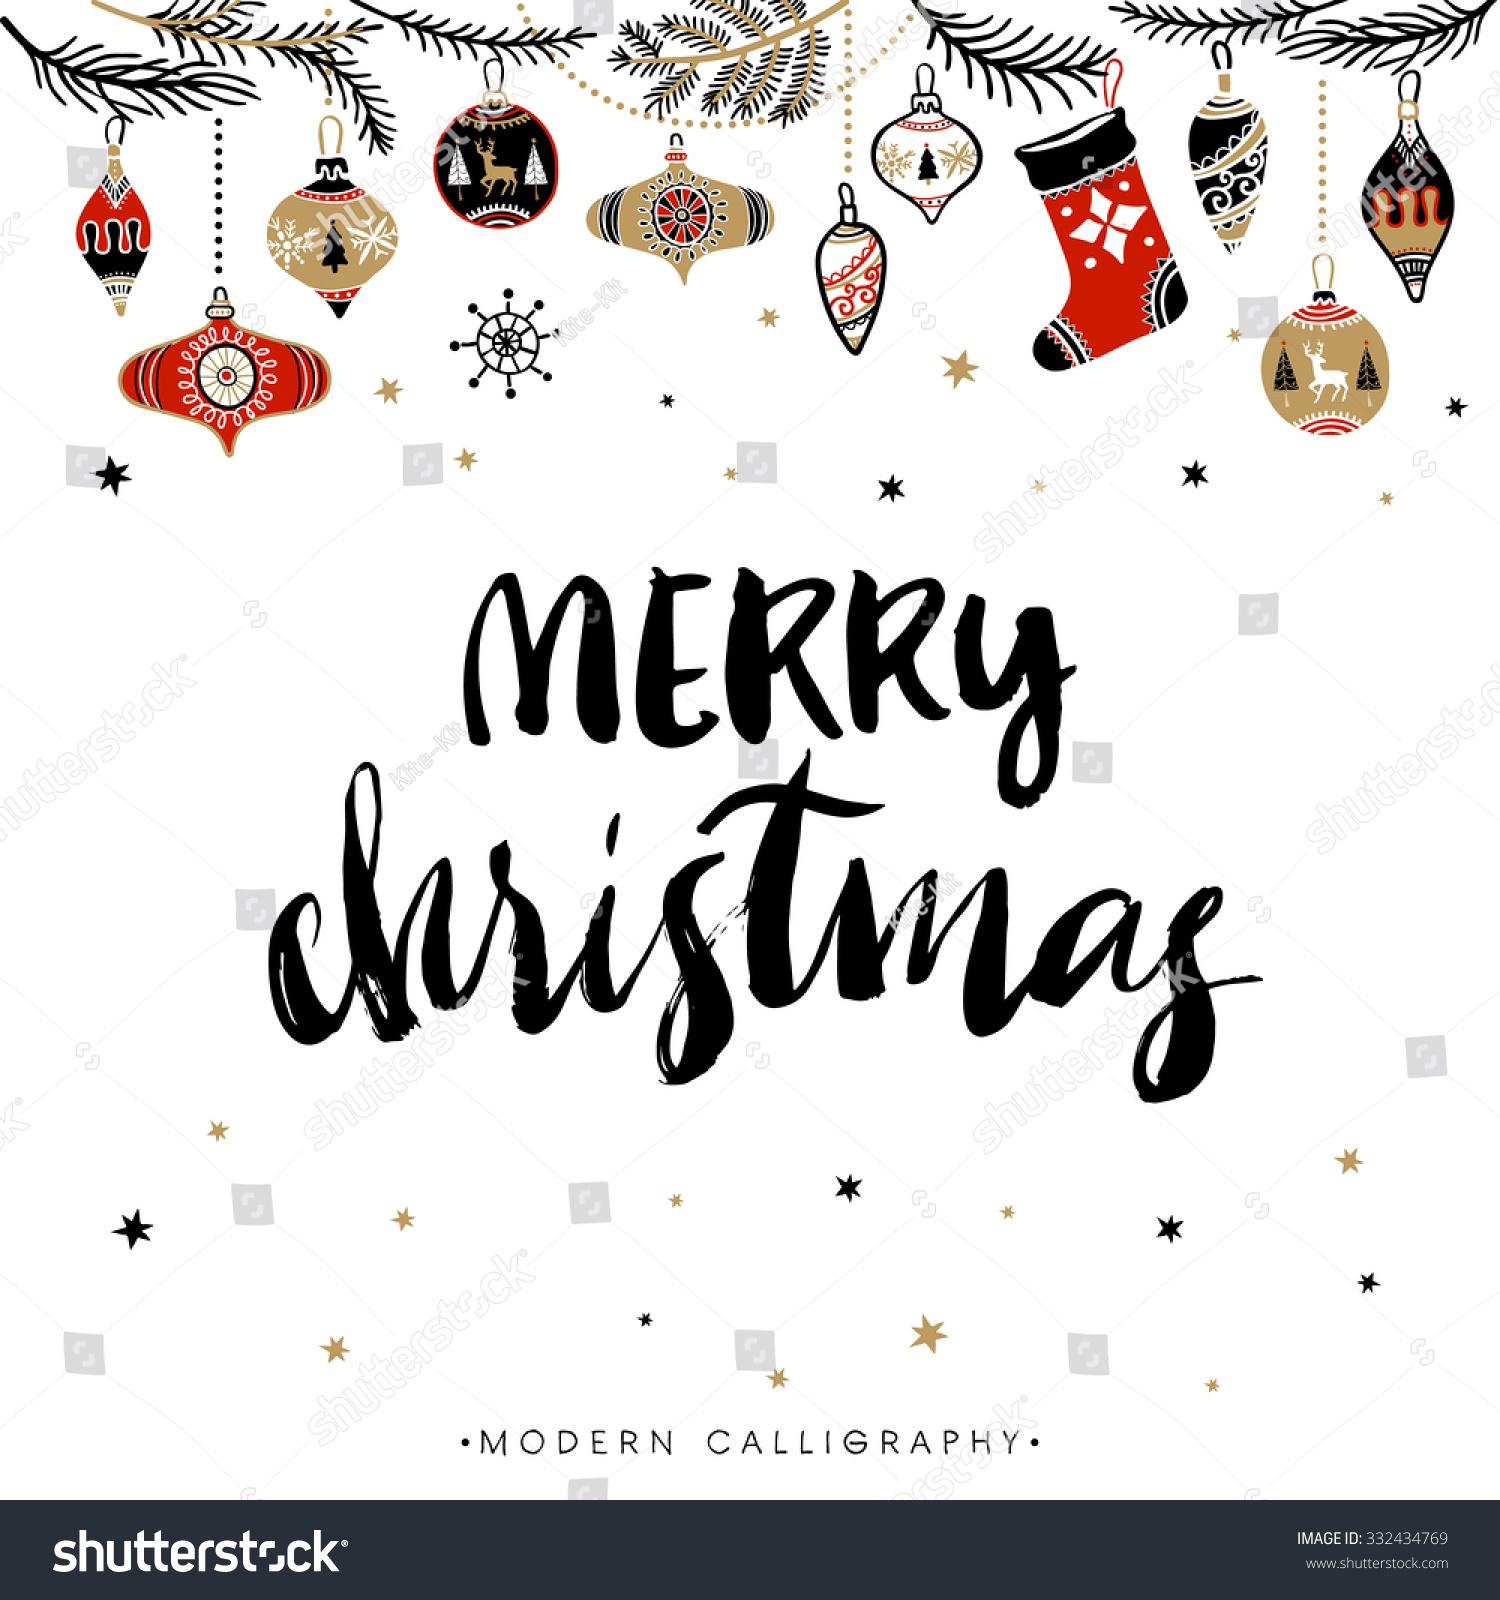 Merry Christmas Christmas Calligraphy Handwritten Modern Stock ...